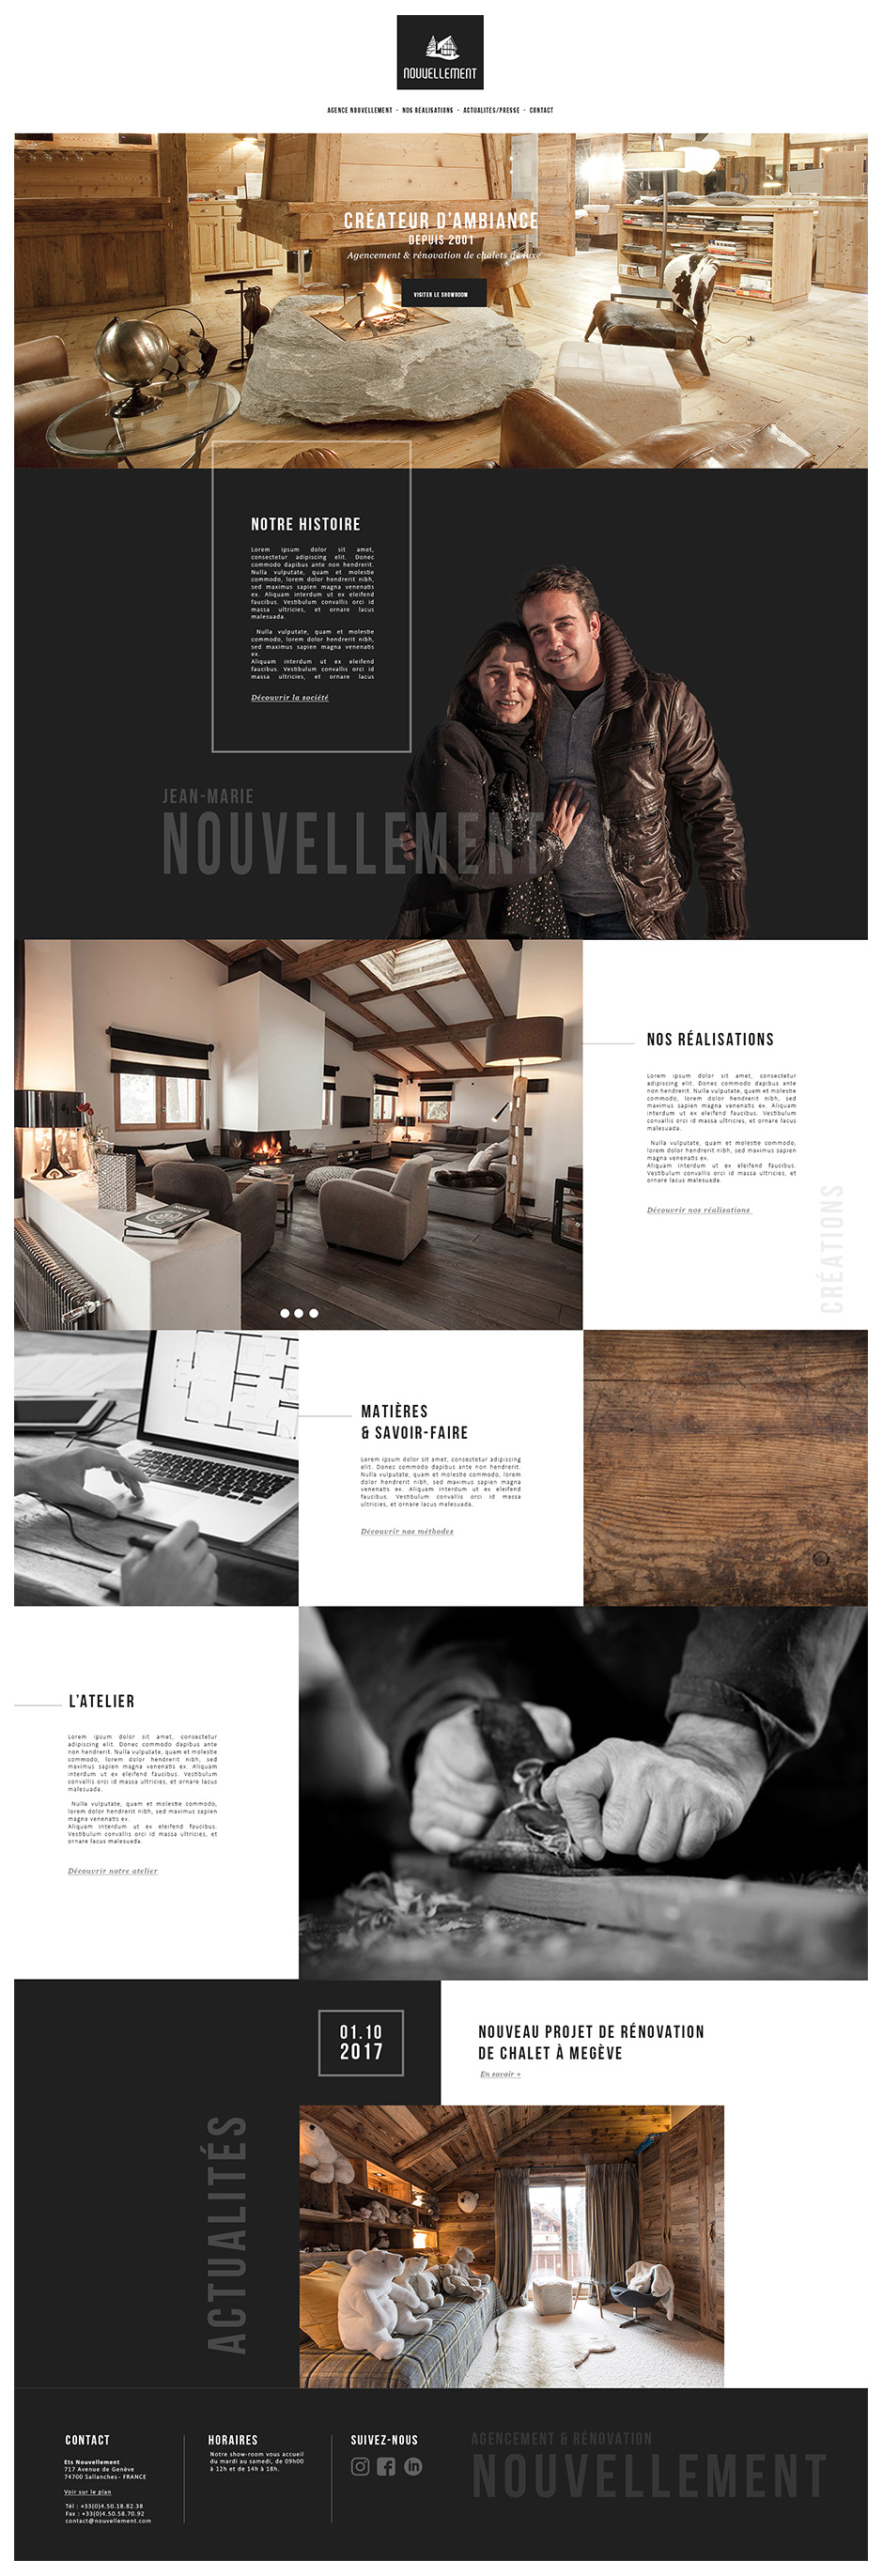 Homepage site Nouvellement